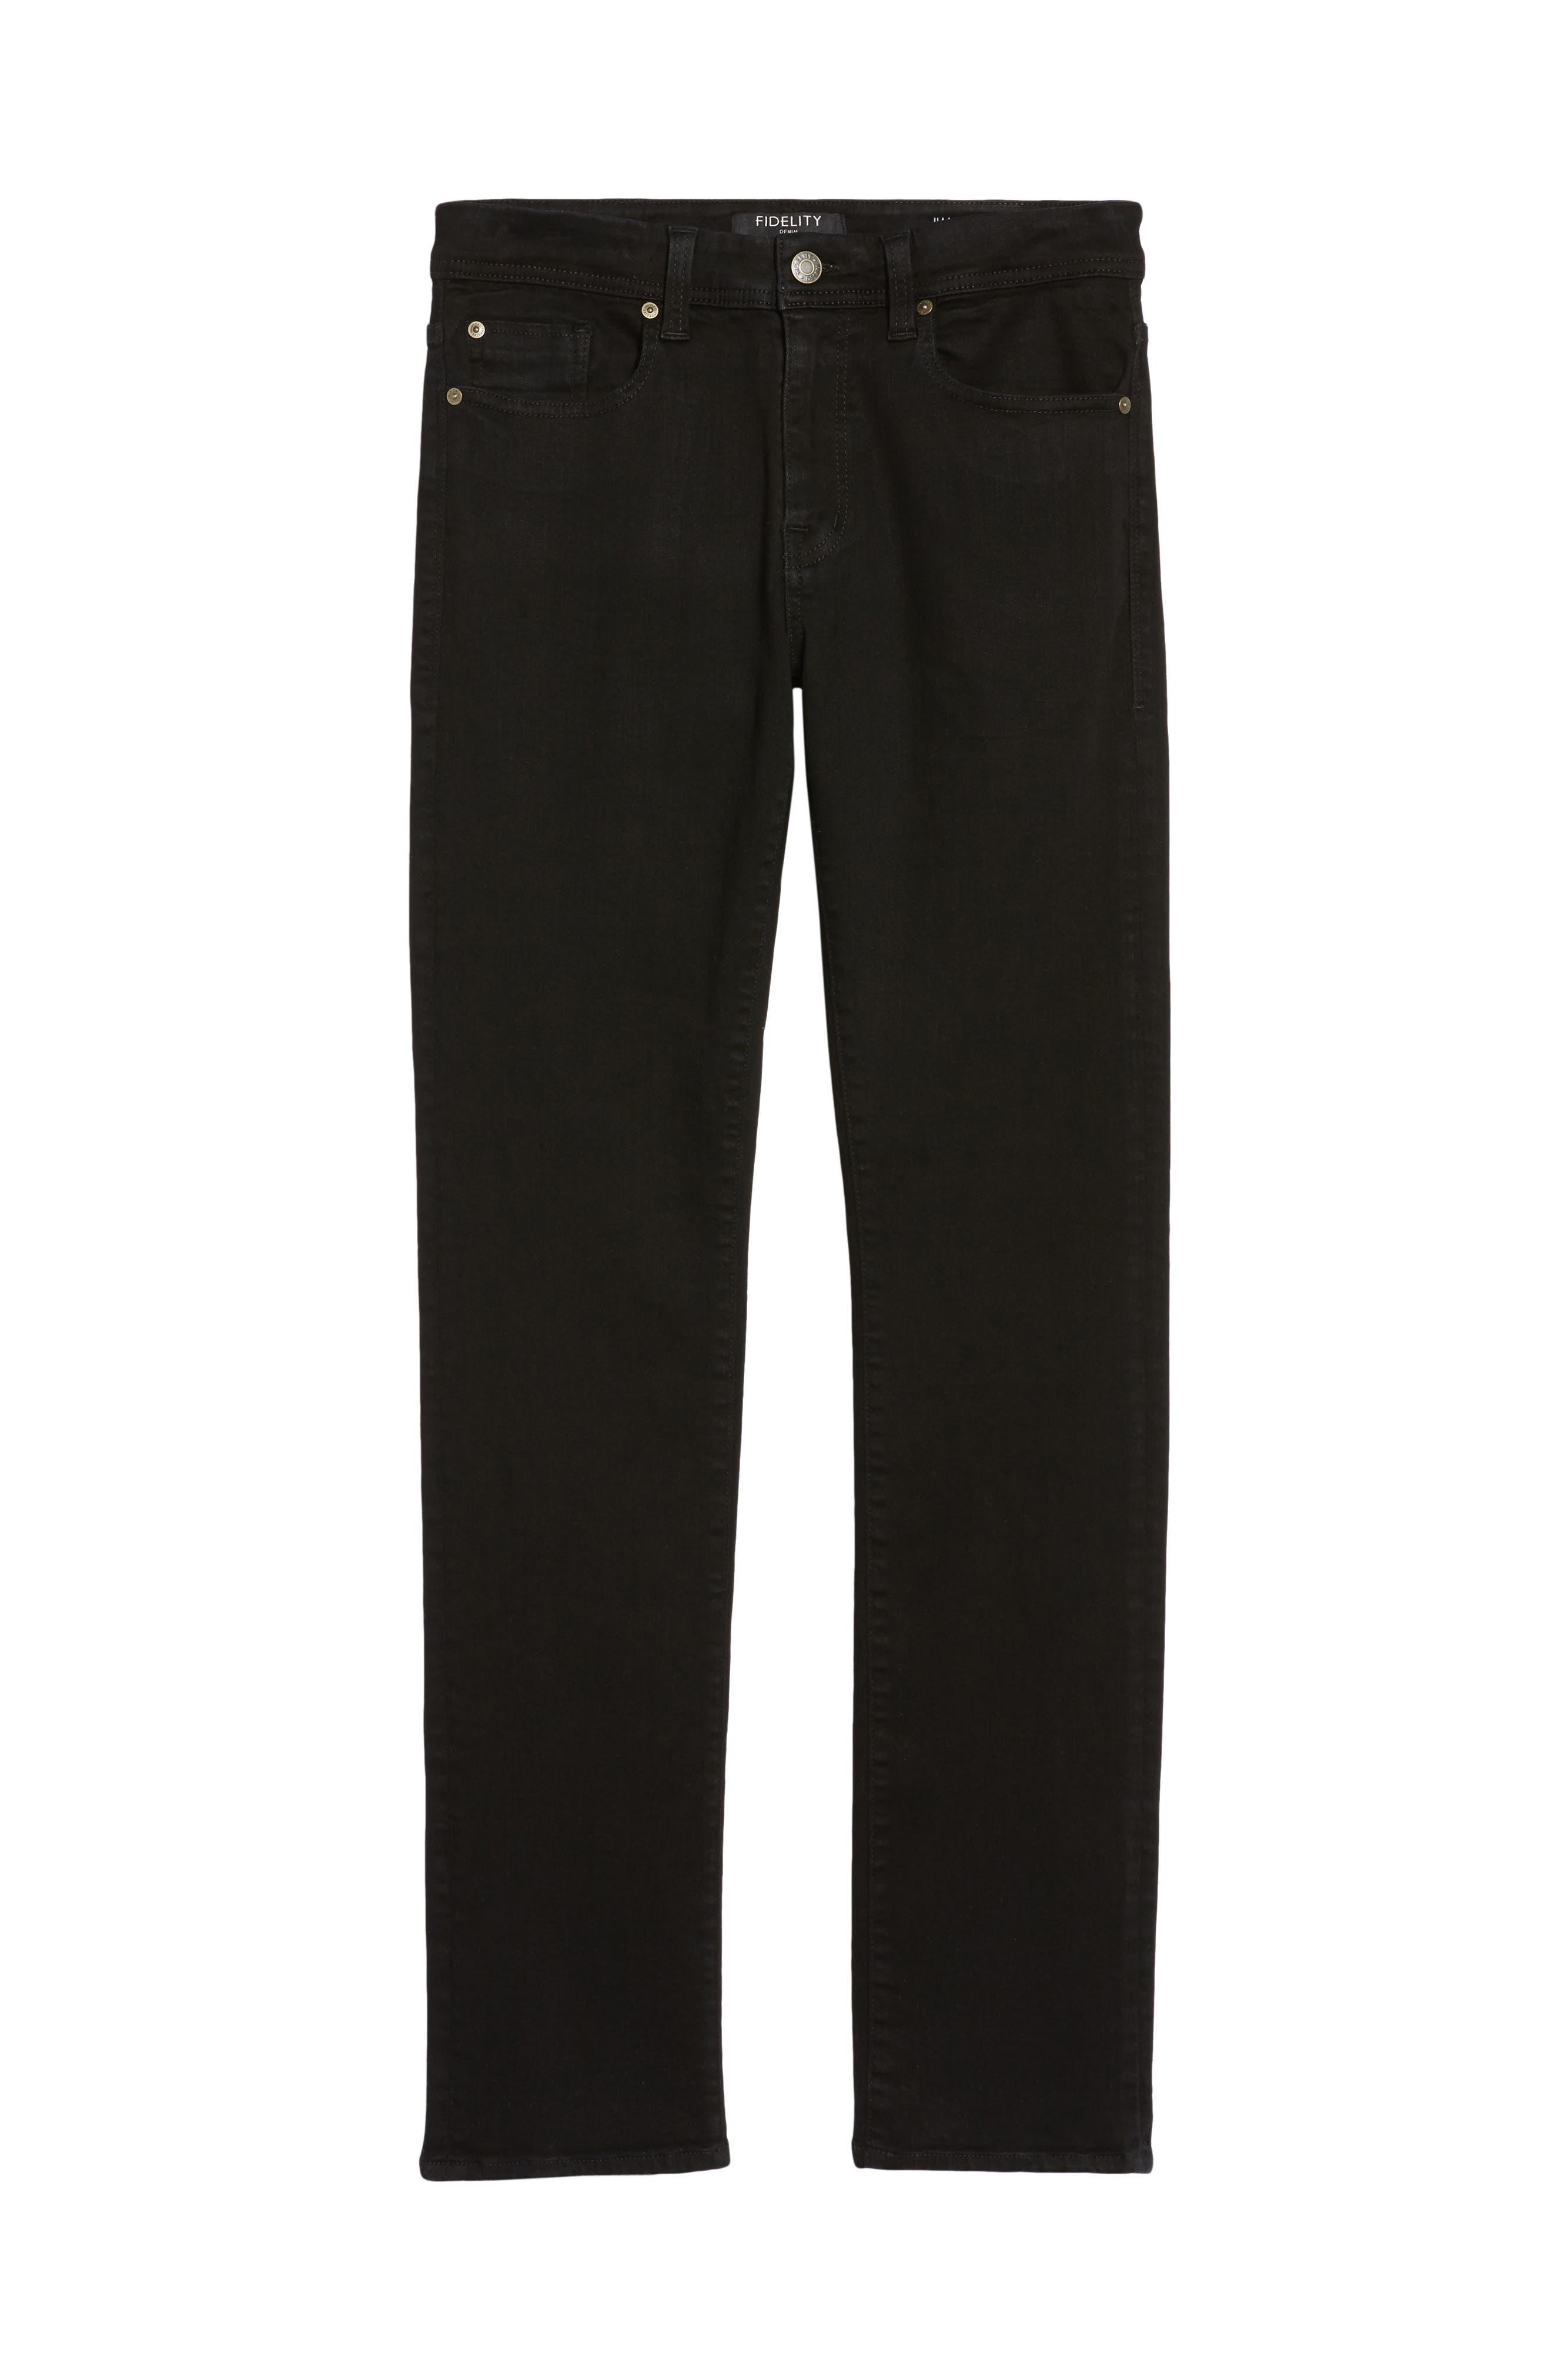 Jimmy Slim Straight leg Jeans,                             Main thumbnail 1, color,                             Everblack